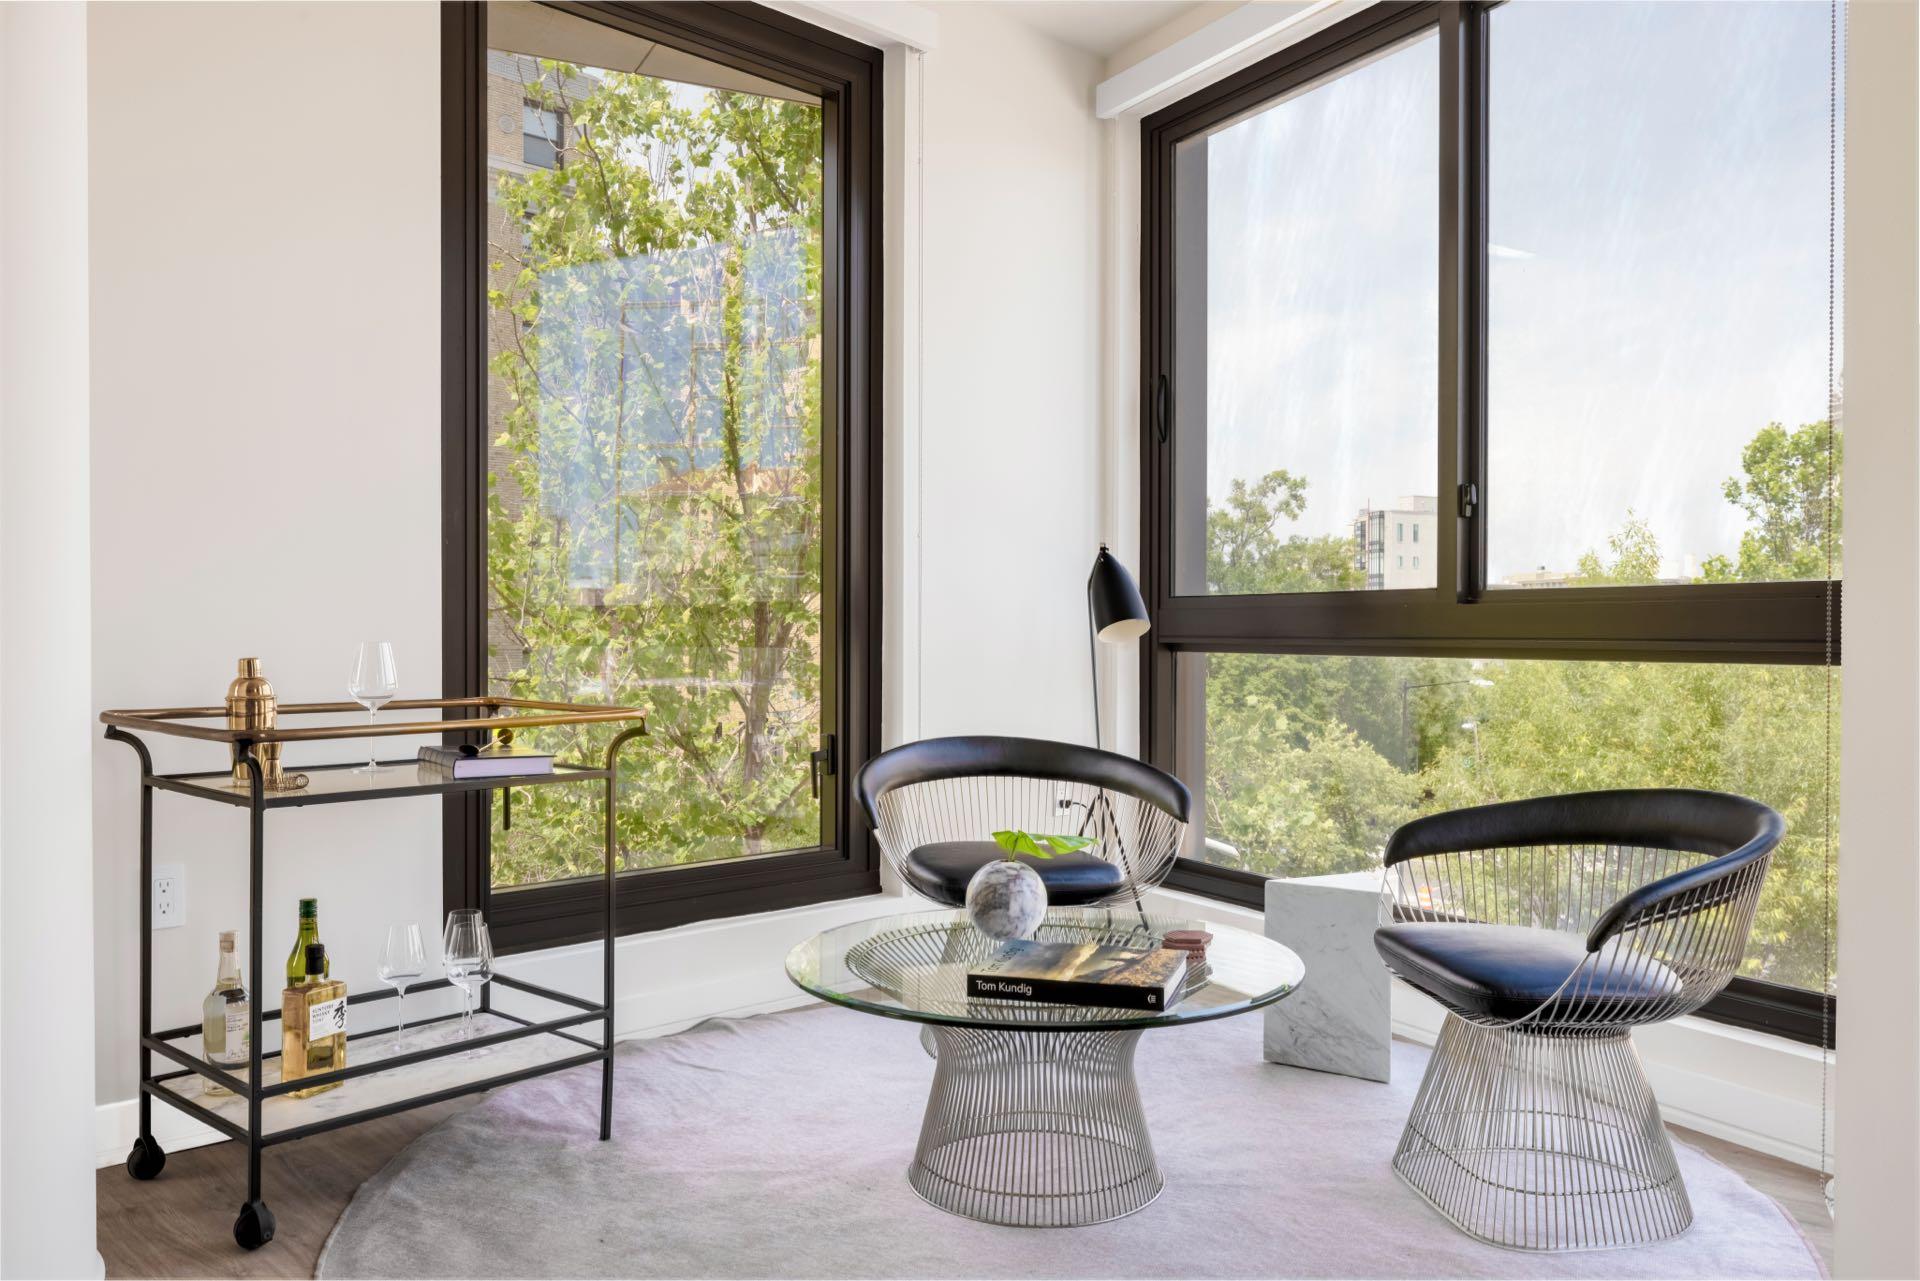 Luxury living in Adams Morgan